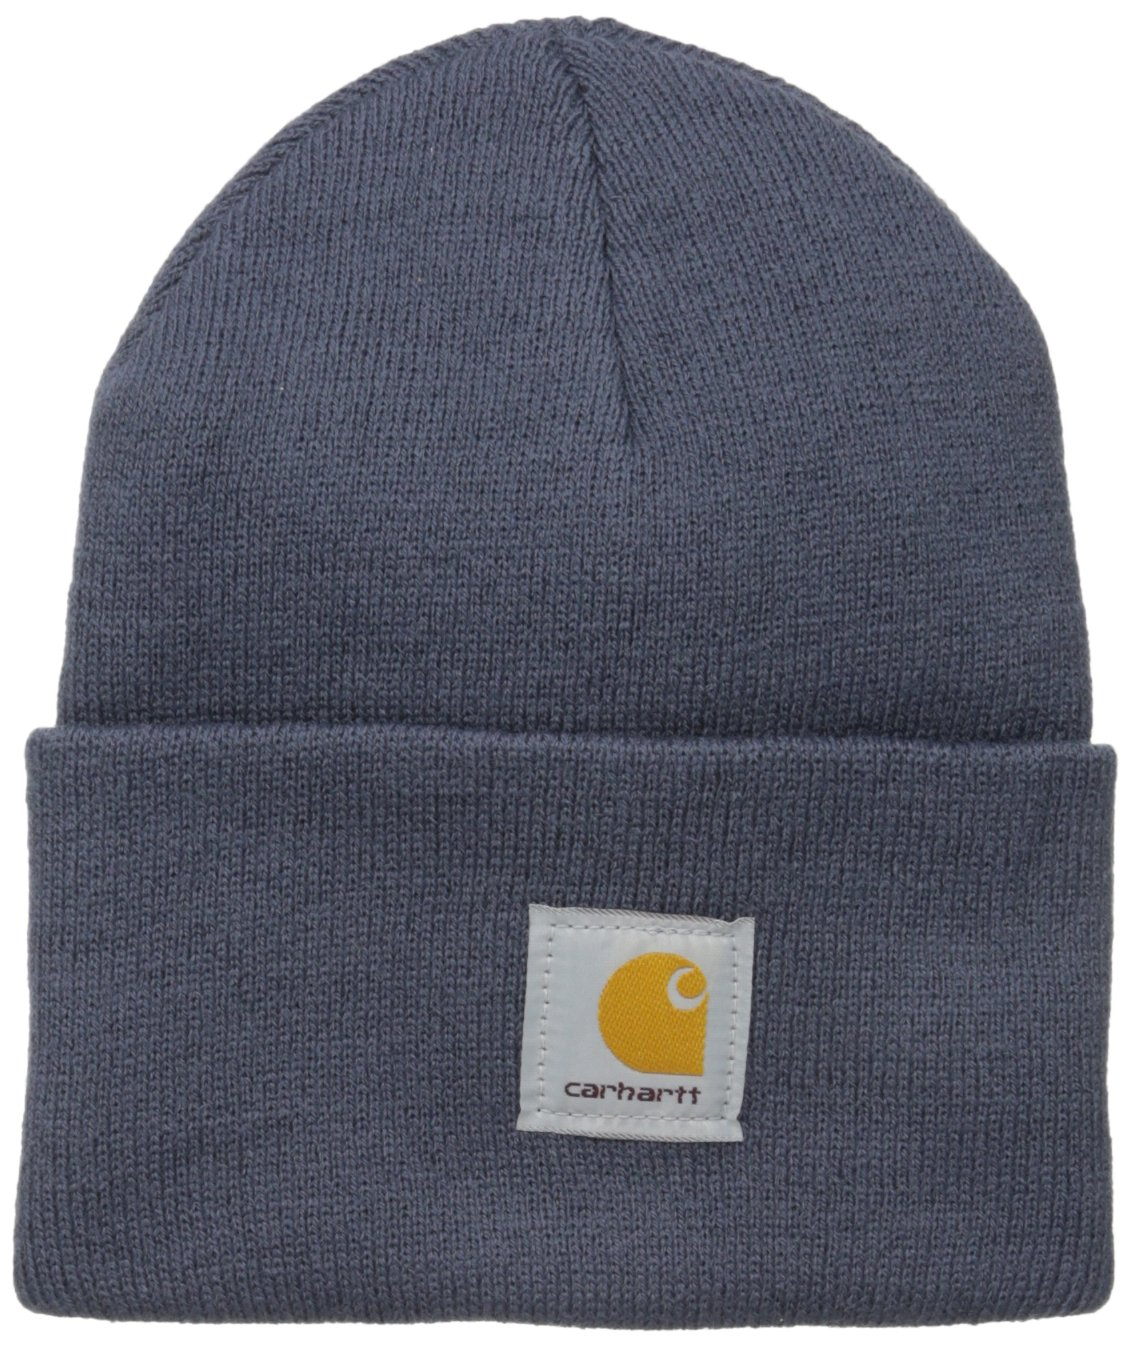 Carhartt HAT メンズ A18 B007L5MMIA One Size|ブルーストーン